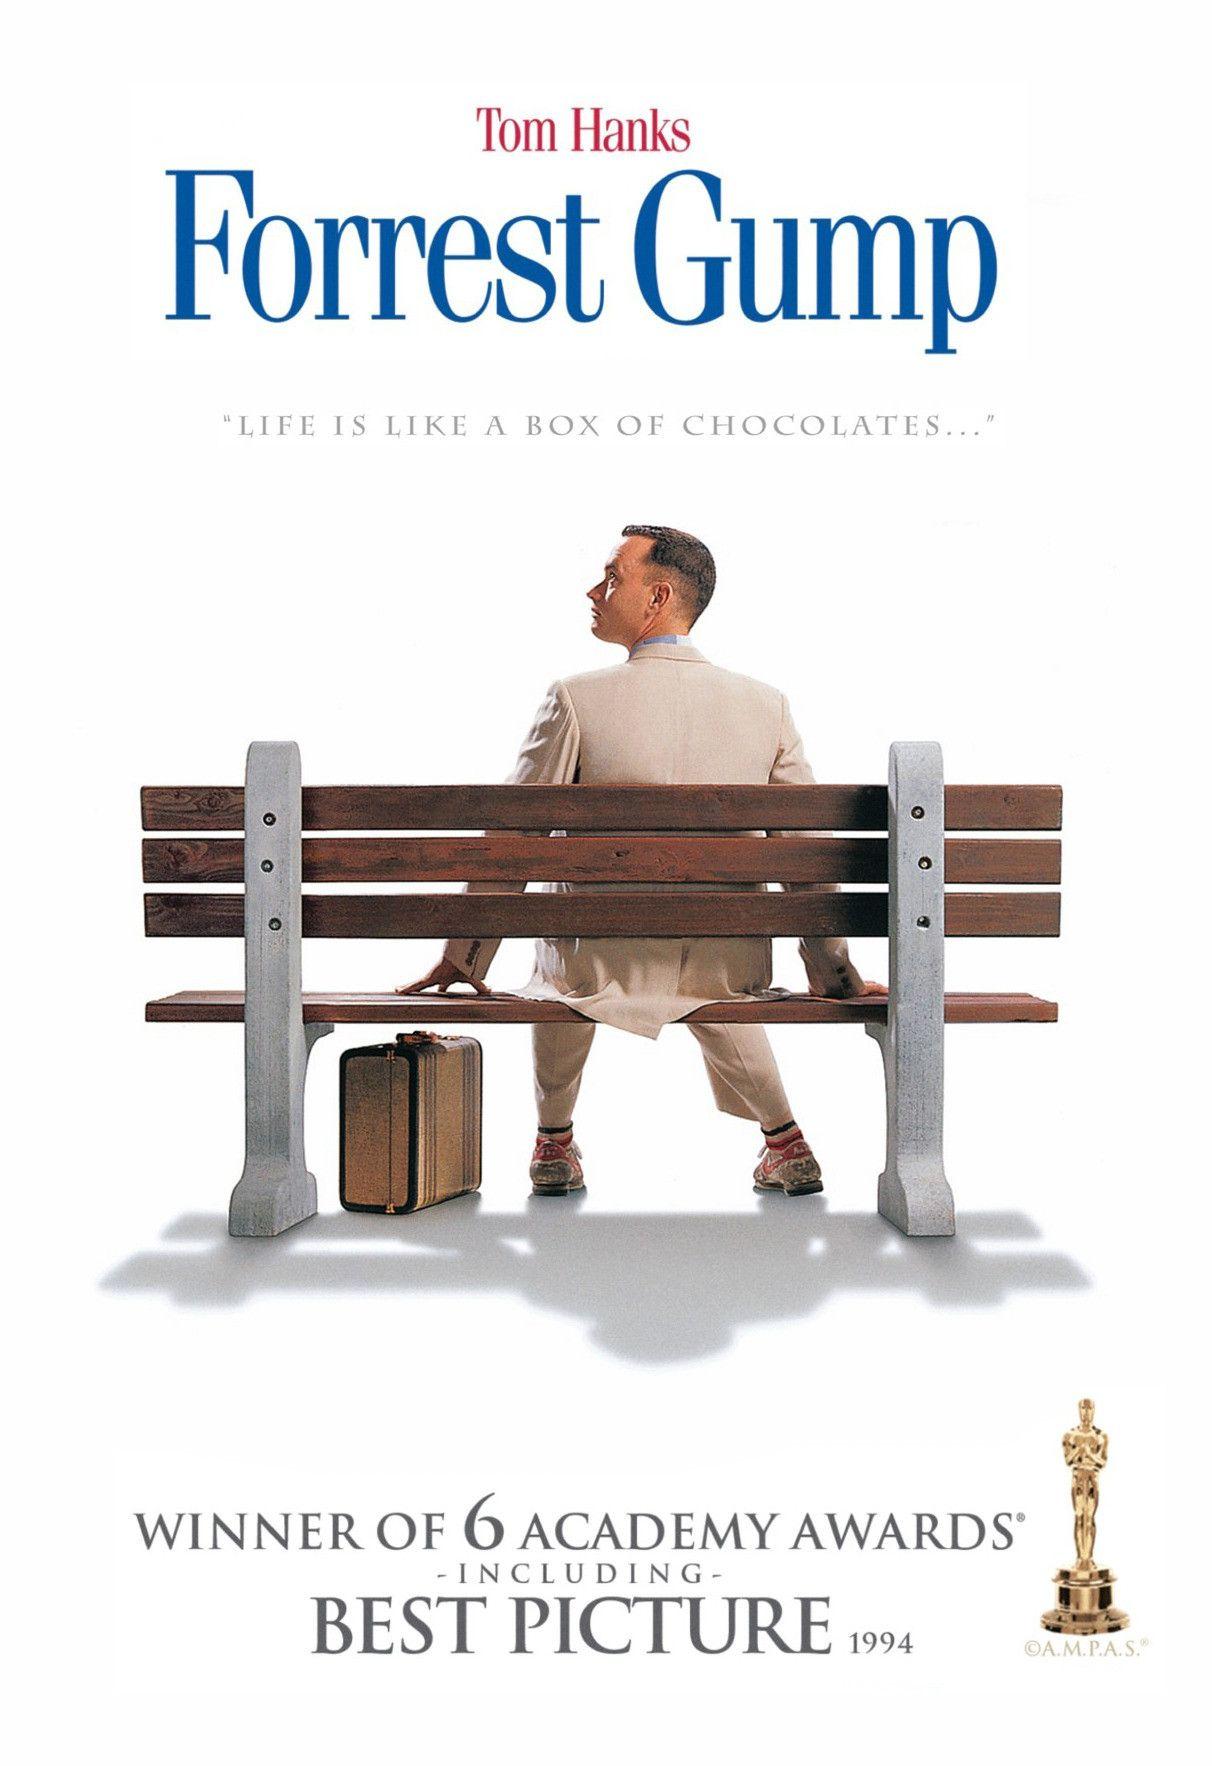 Forest Gump American Romantic Comedy-Drama Film Stars Tom Hanks Poster Photo